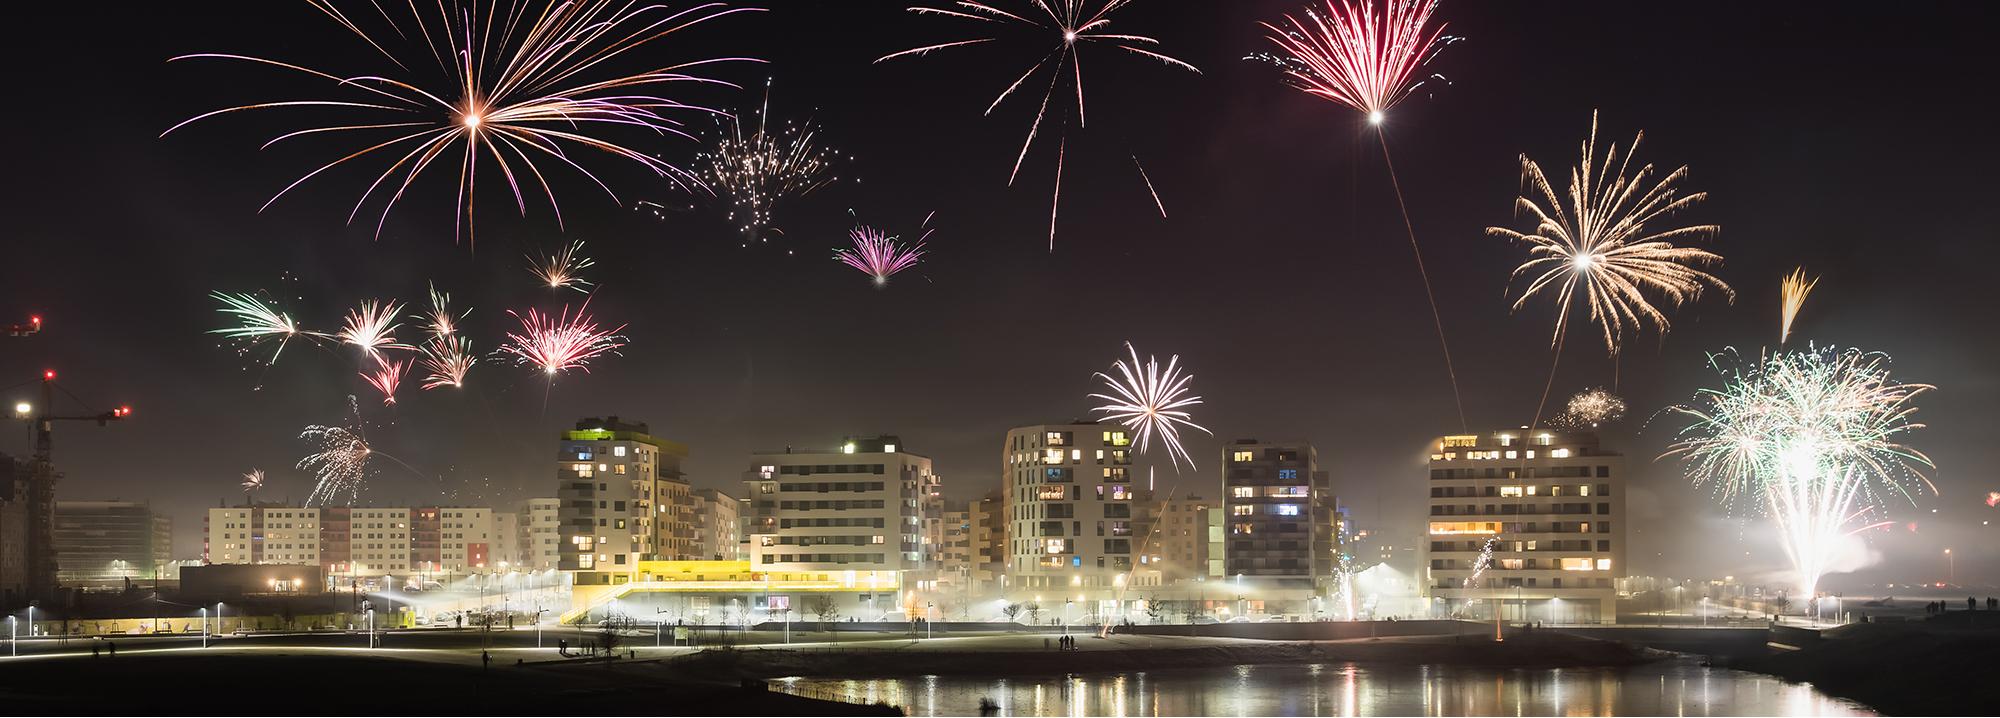 Aspern Seestadt bei Nacht